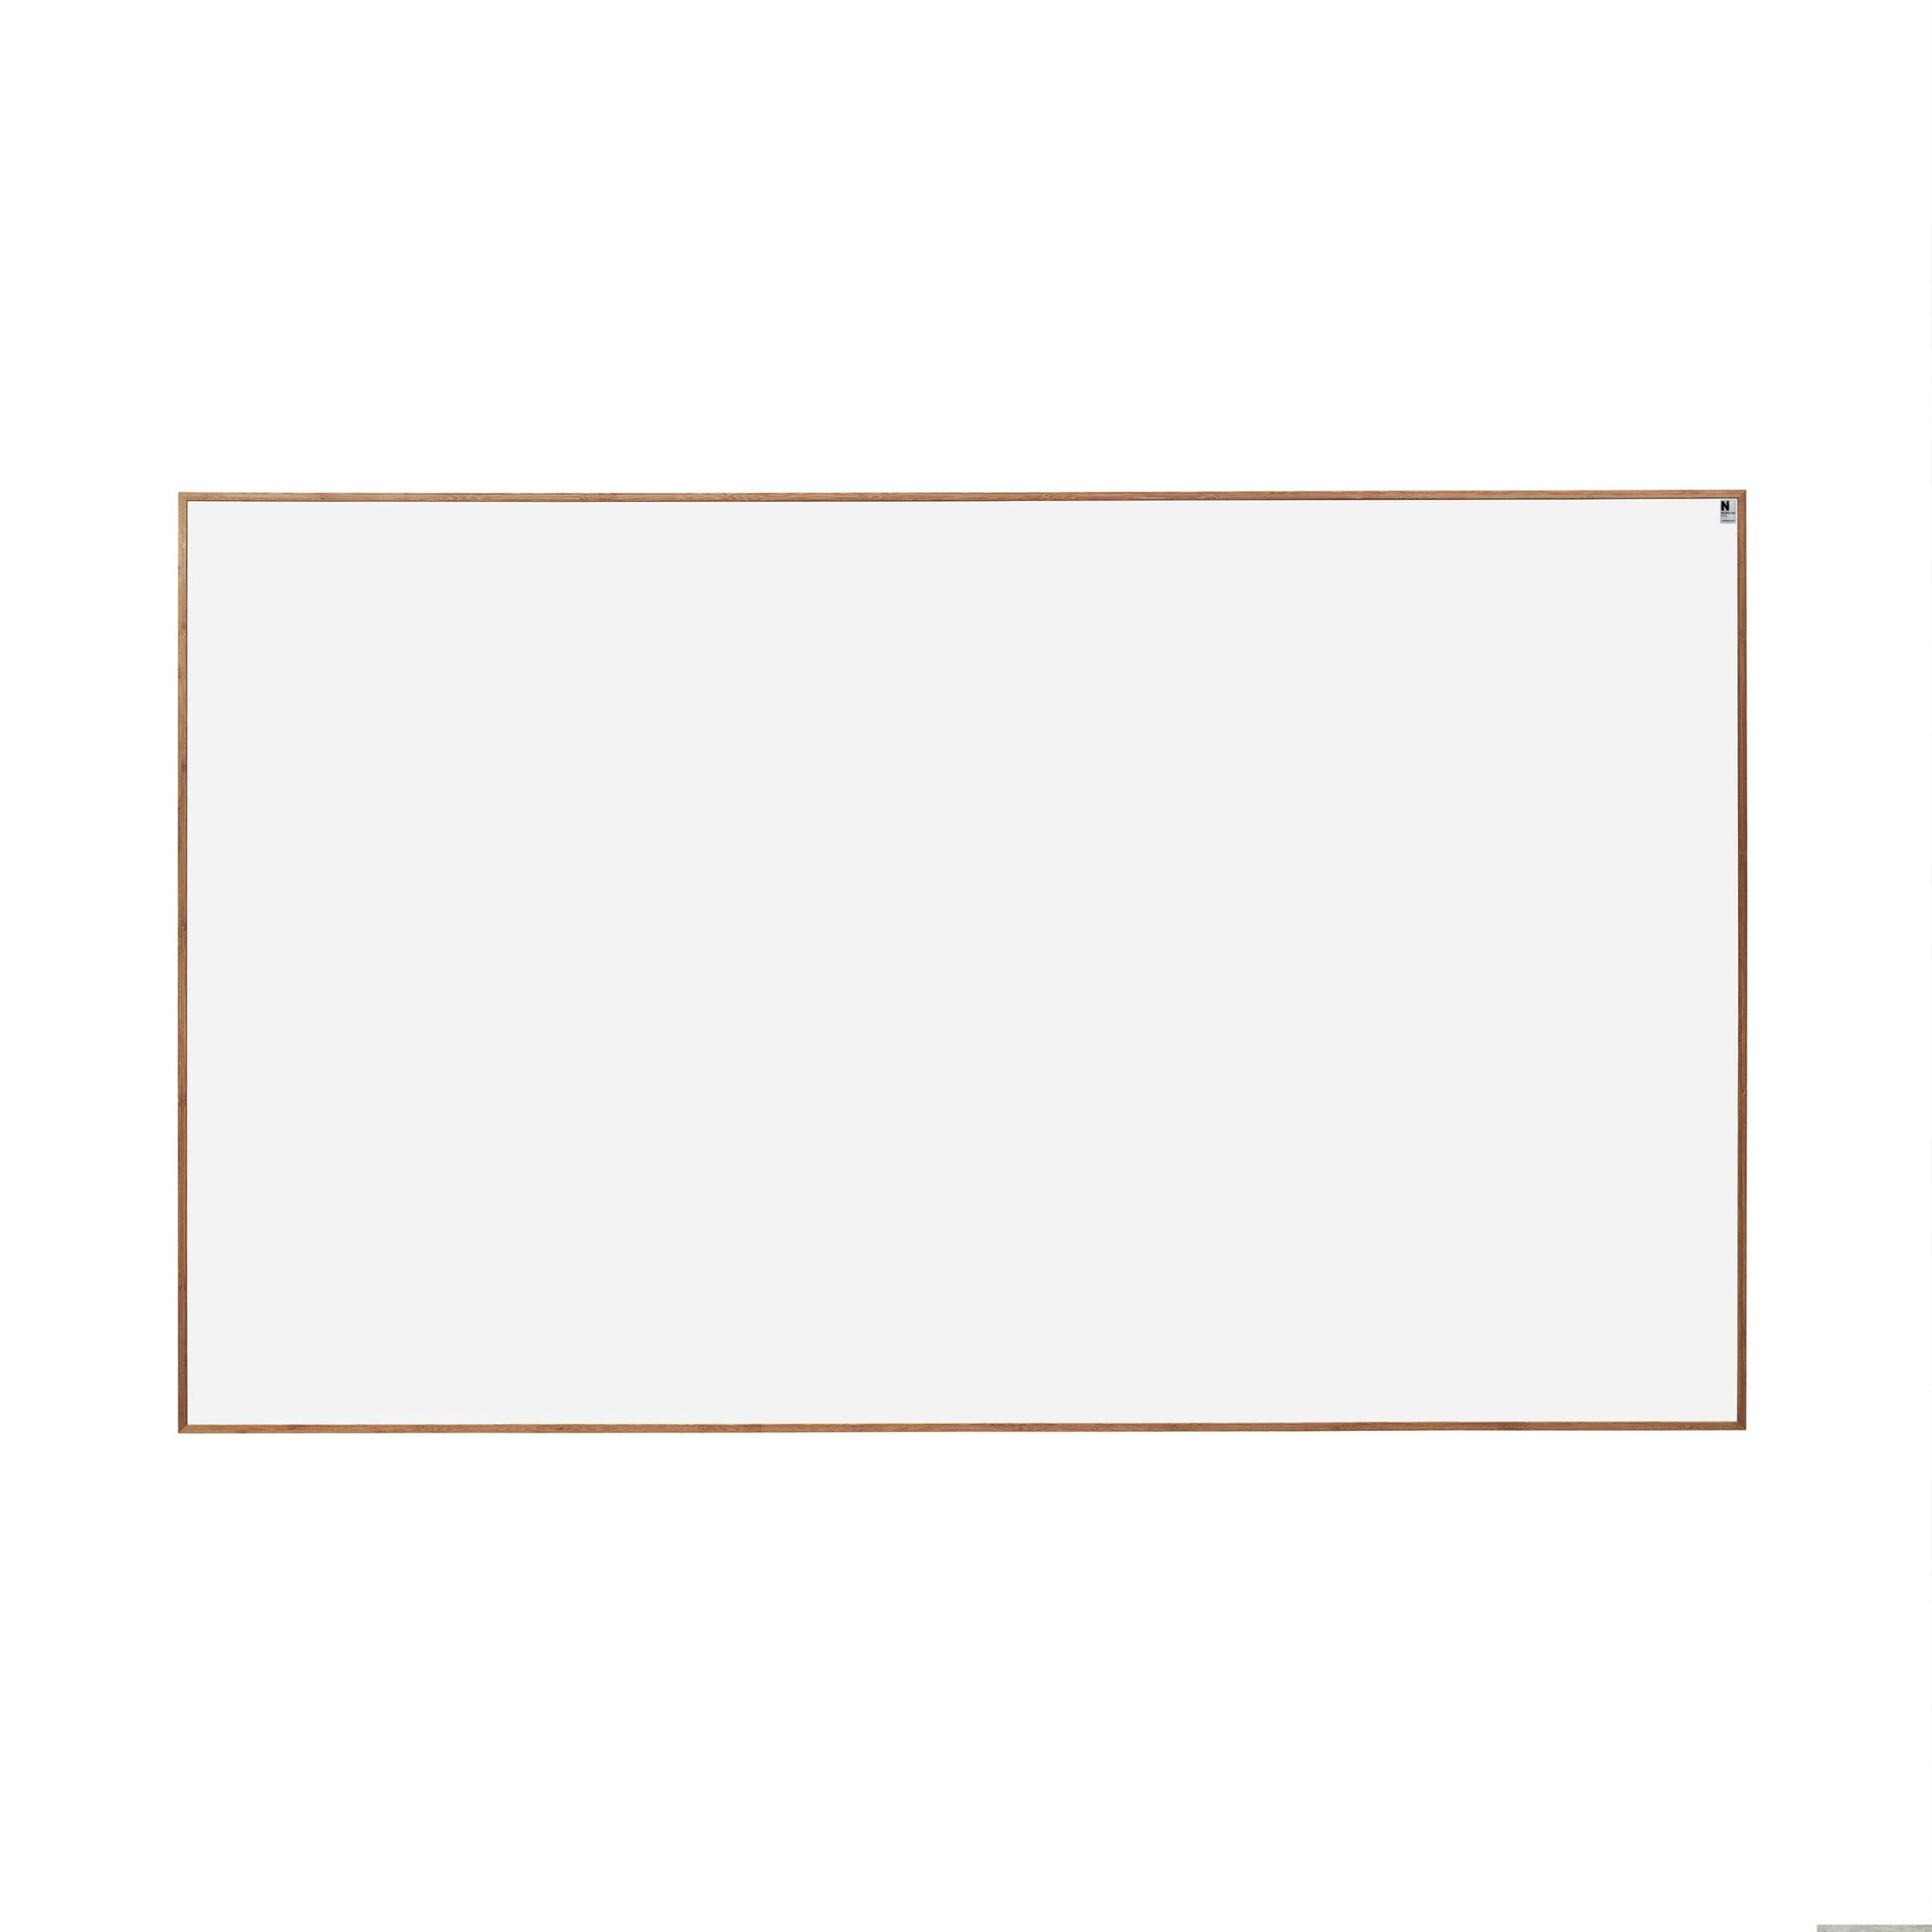 Earth-whiteboard_02